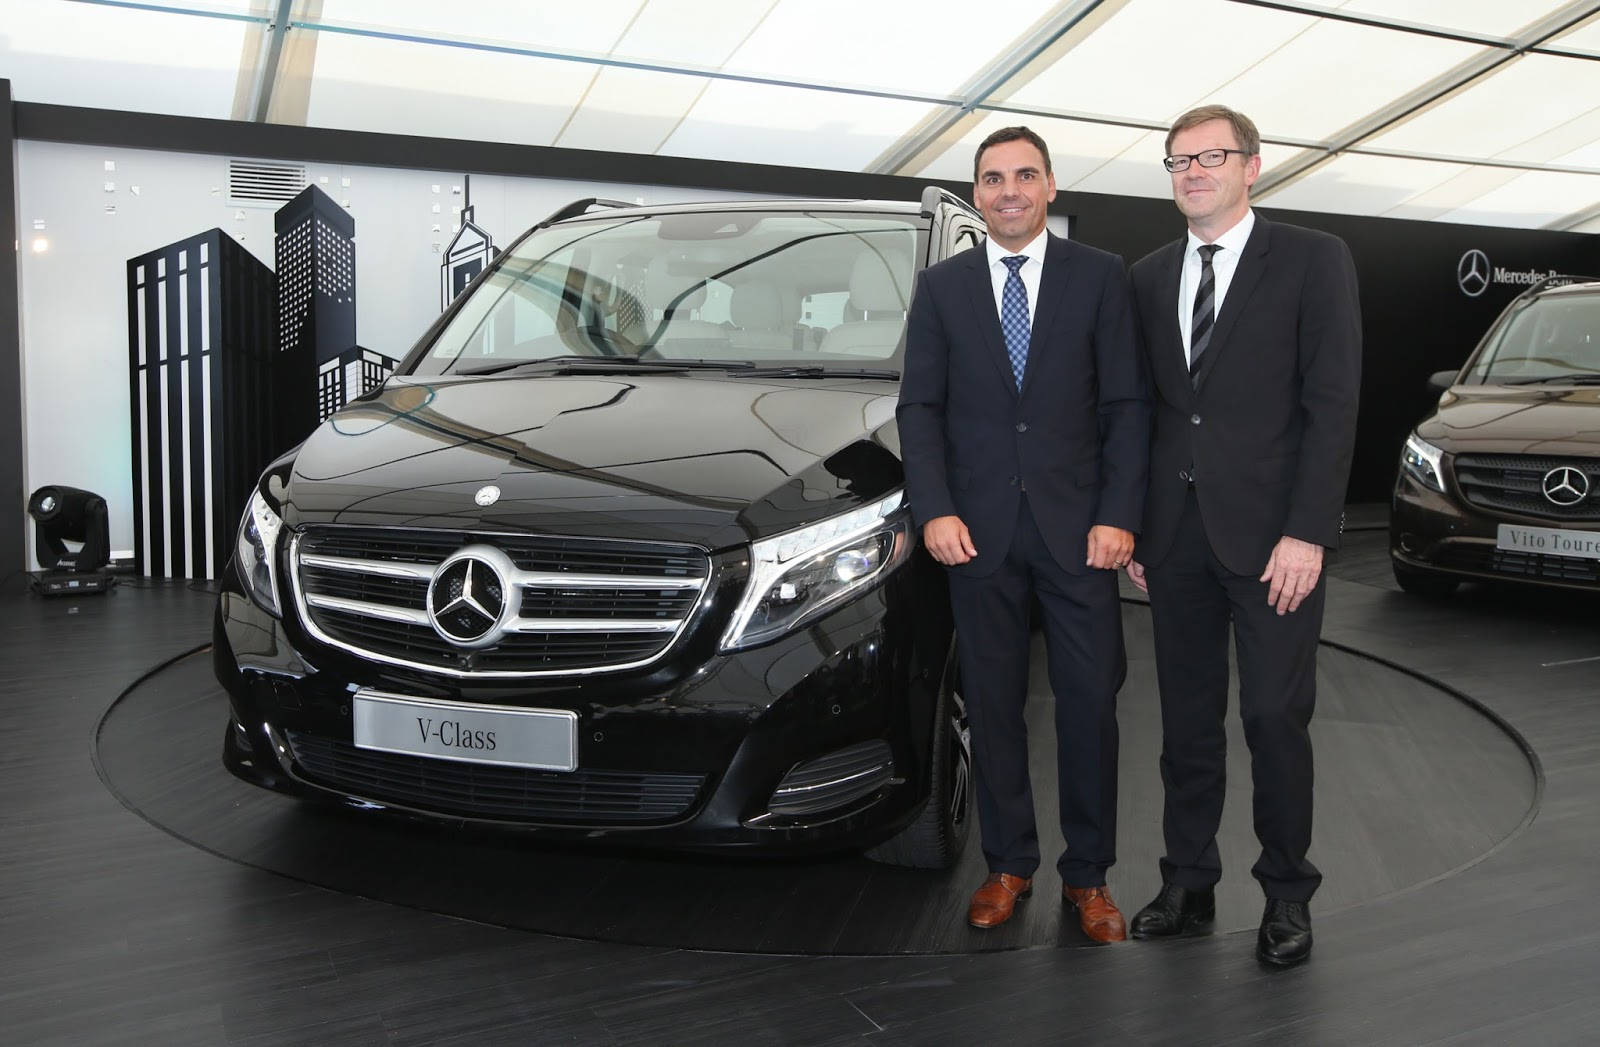 Benz patrick lesbian video adult videos for Mercedes benz of chandler staff